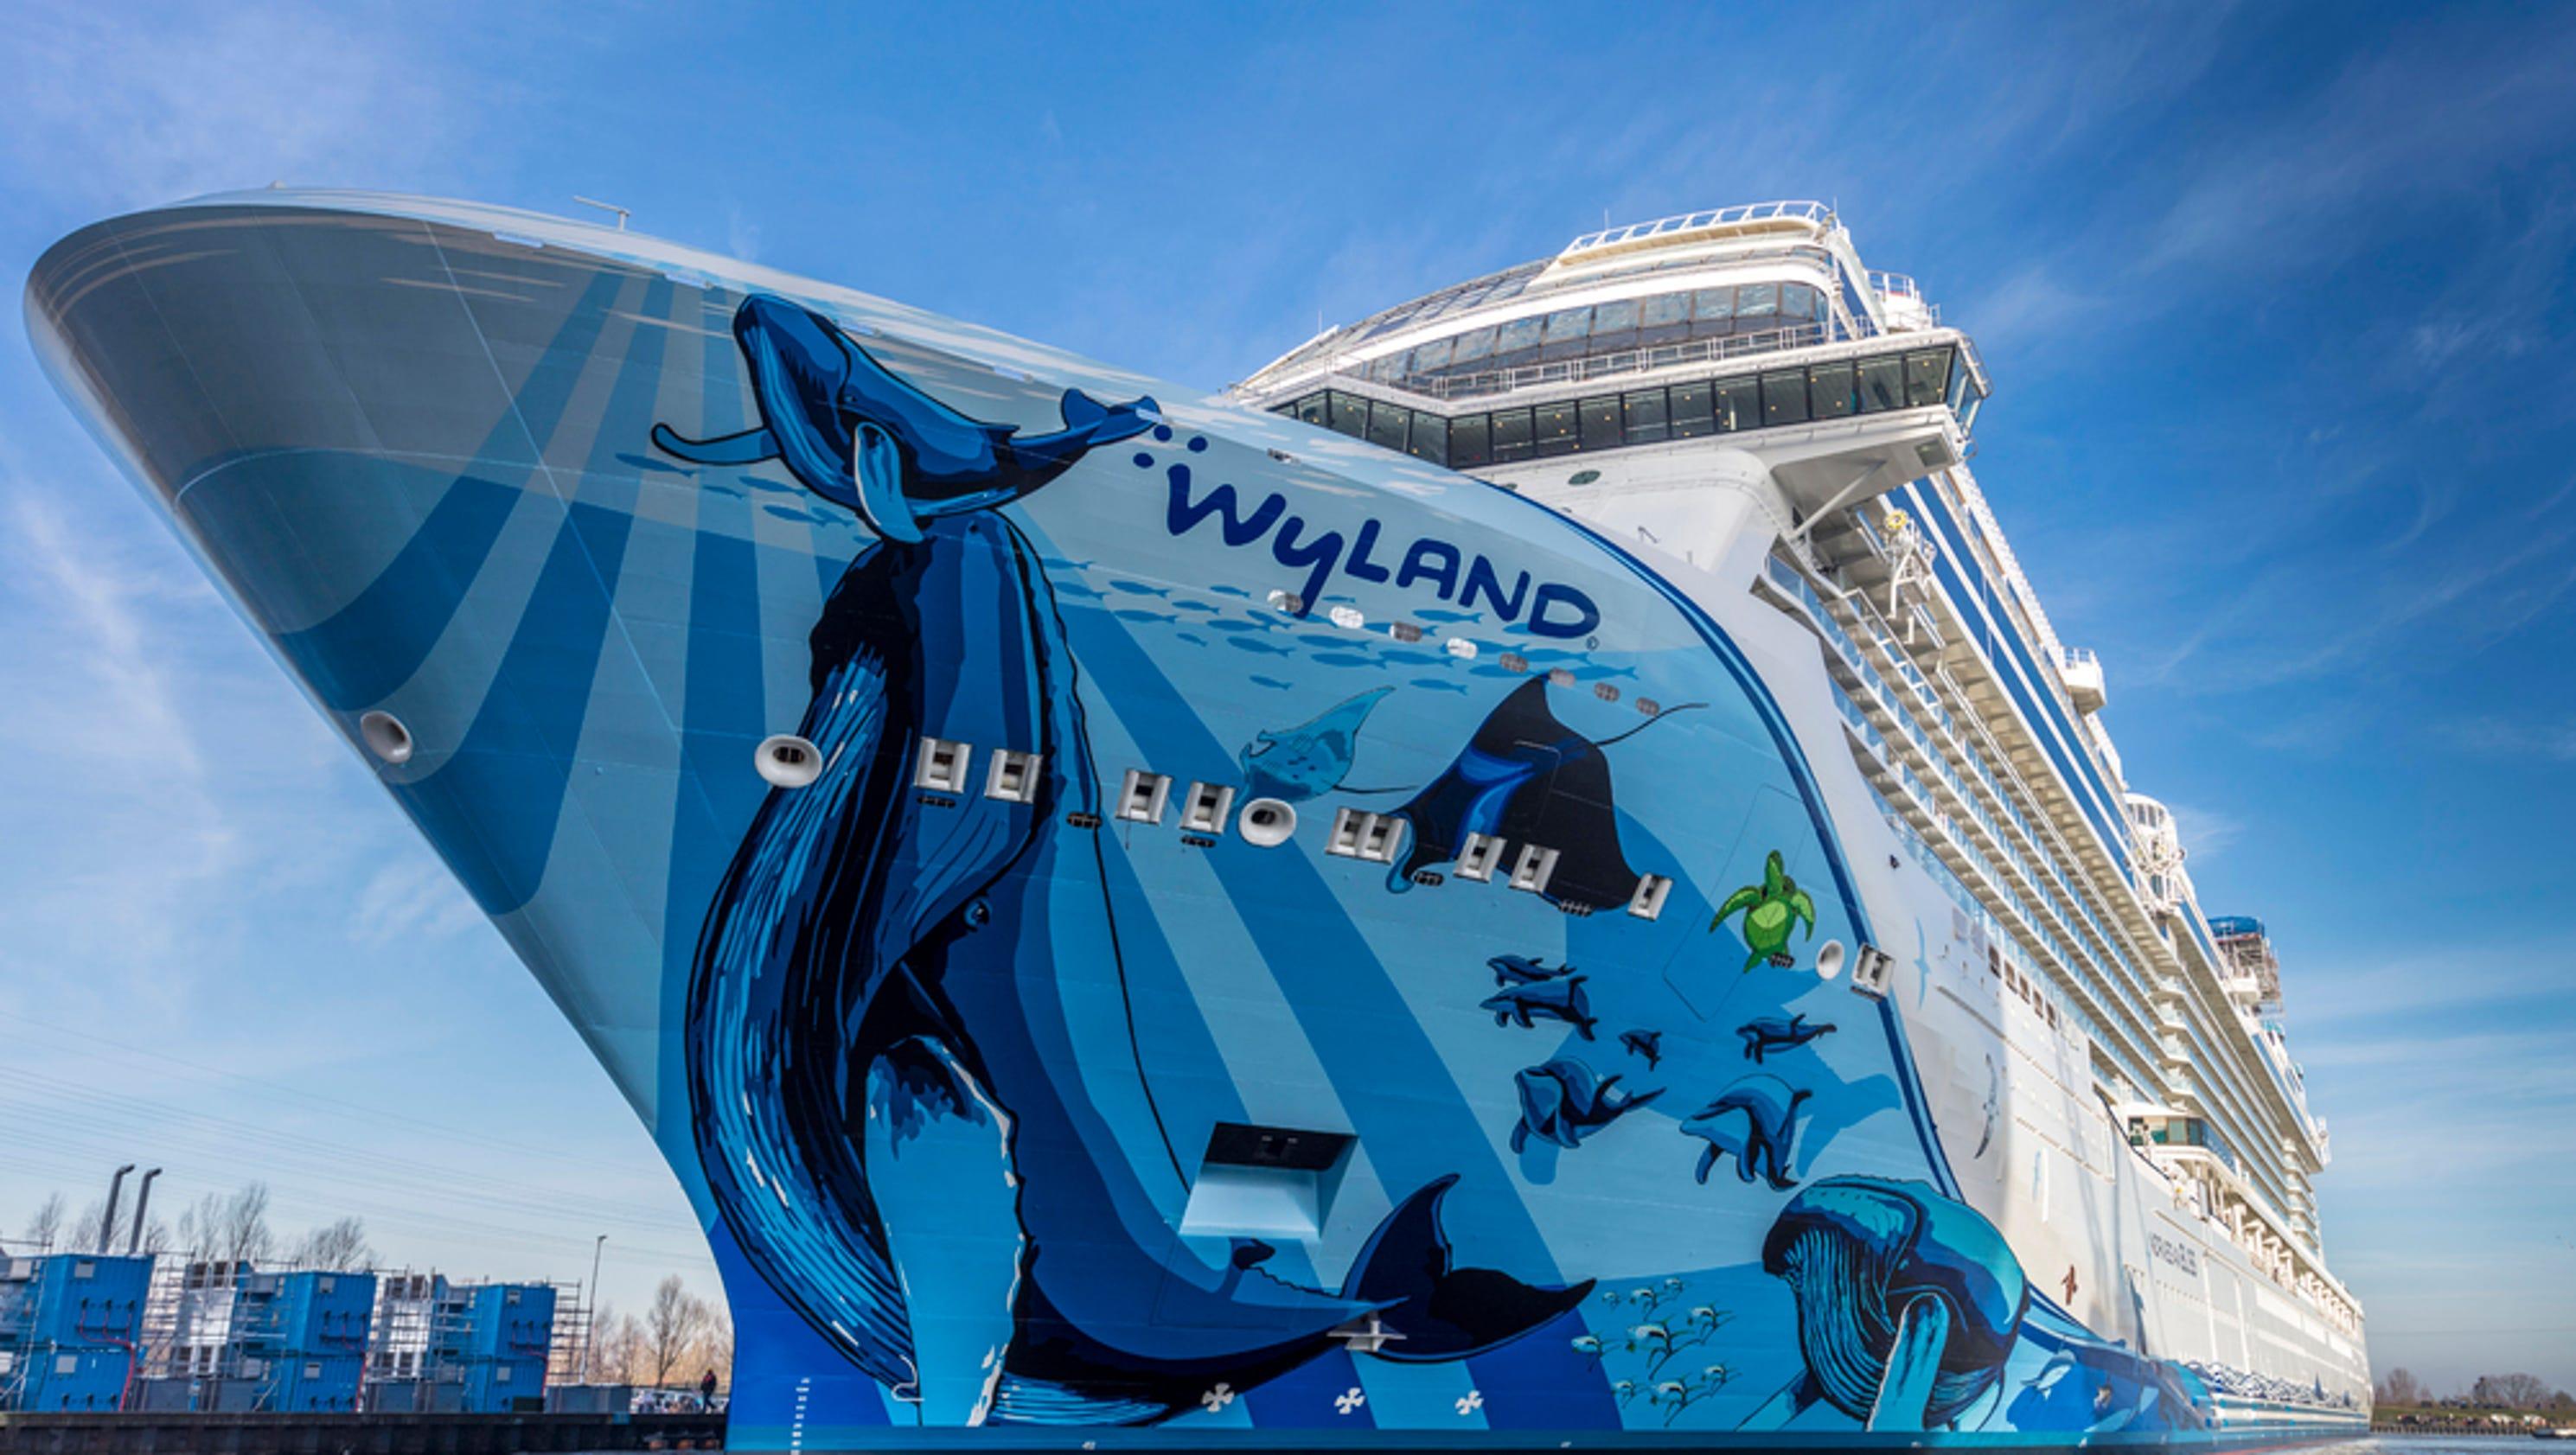 Norwegian Bliss Norwegian Cruise Line S Giant New Ship Debuts